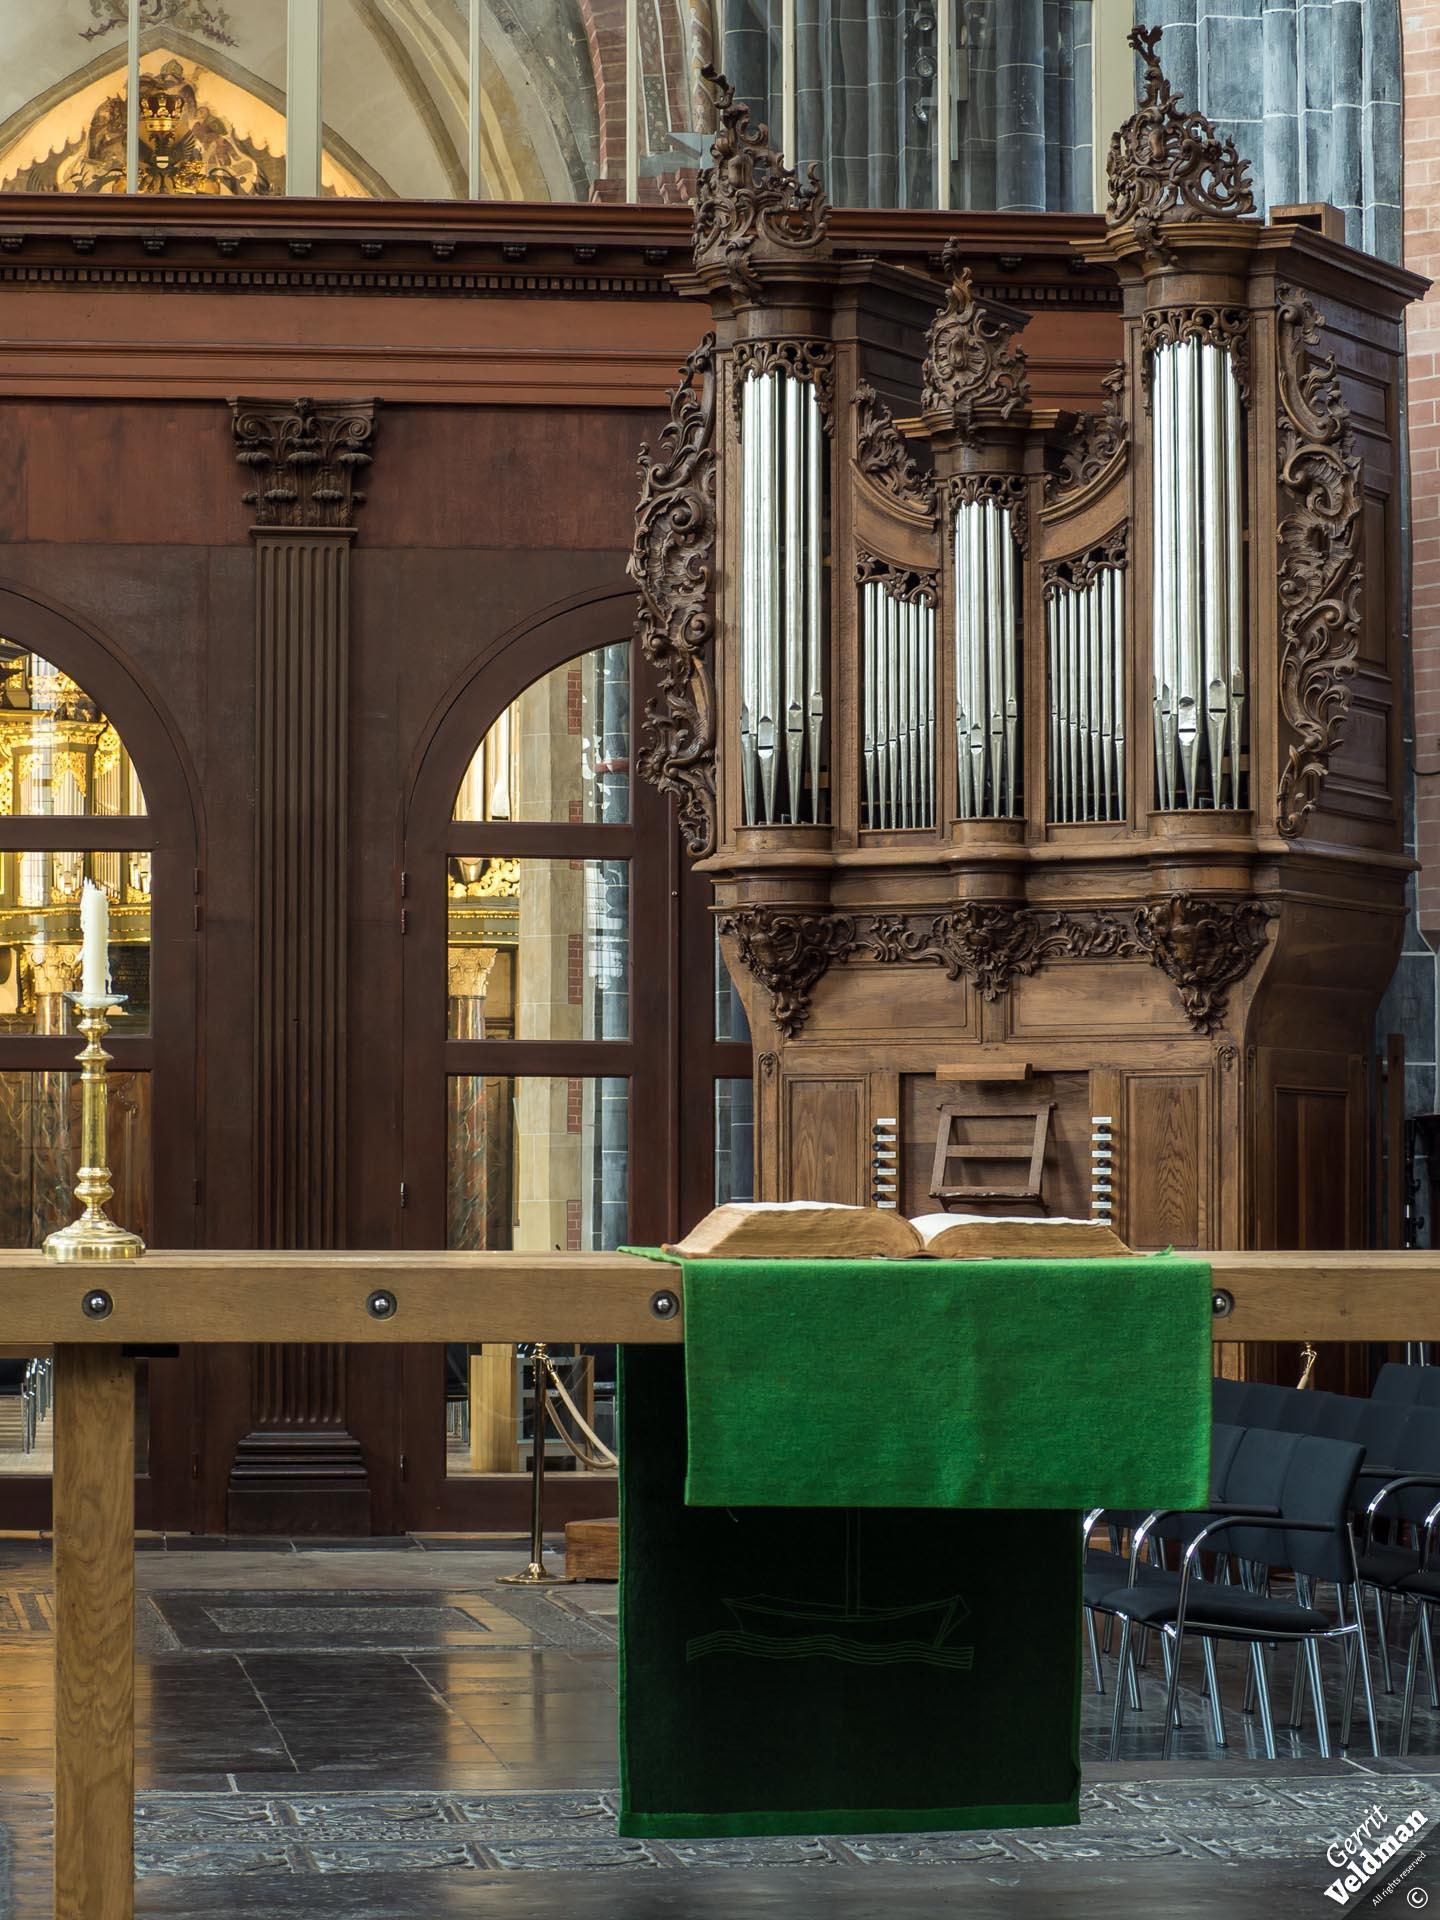 Picard-orgel, Martinikerk, Groningen